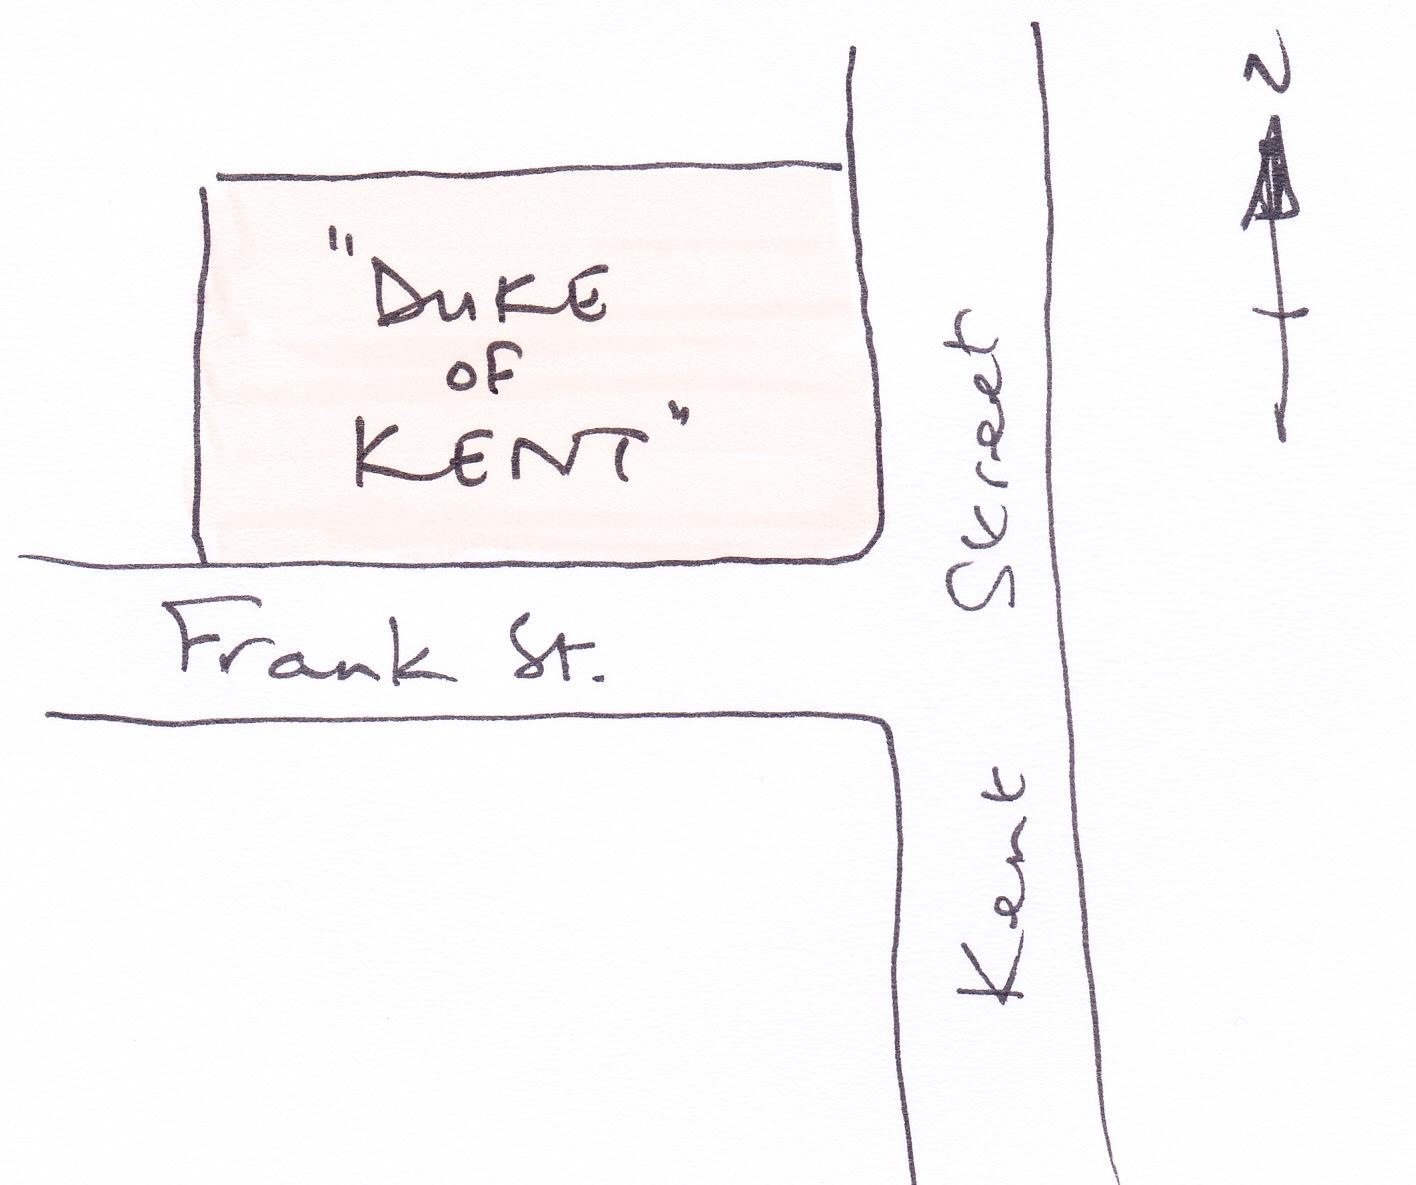 PRESTON'S INNS, TAVERNS and BEERHOUSES: DUKE OF KENT, 1